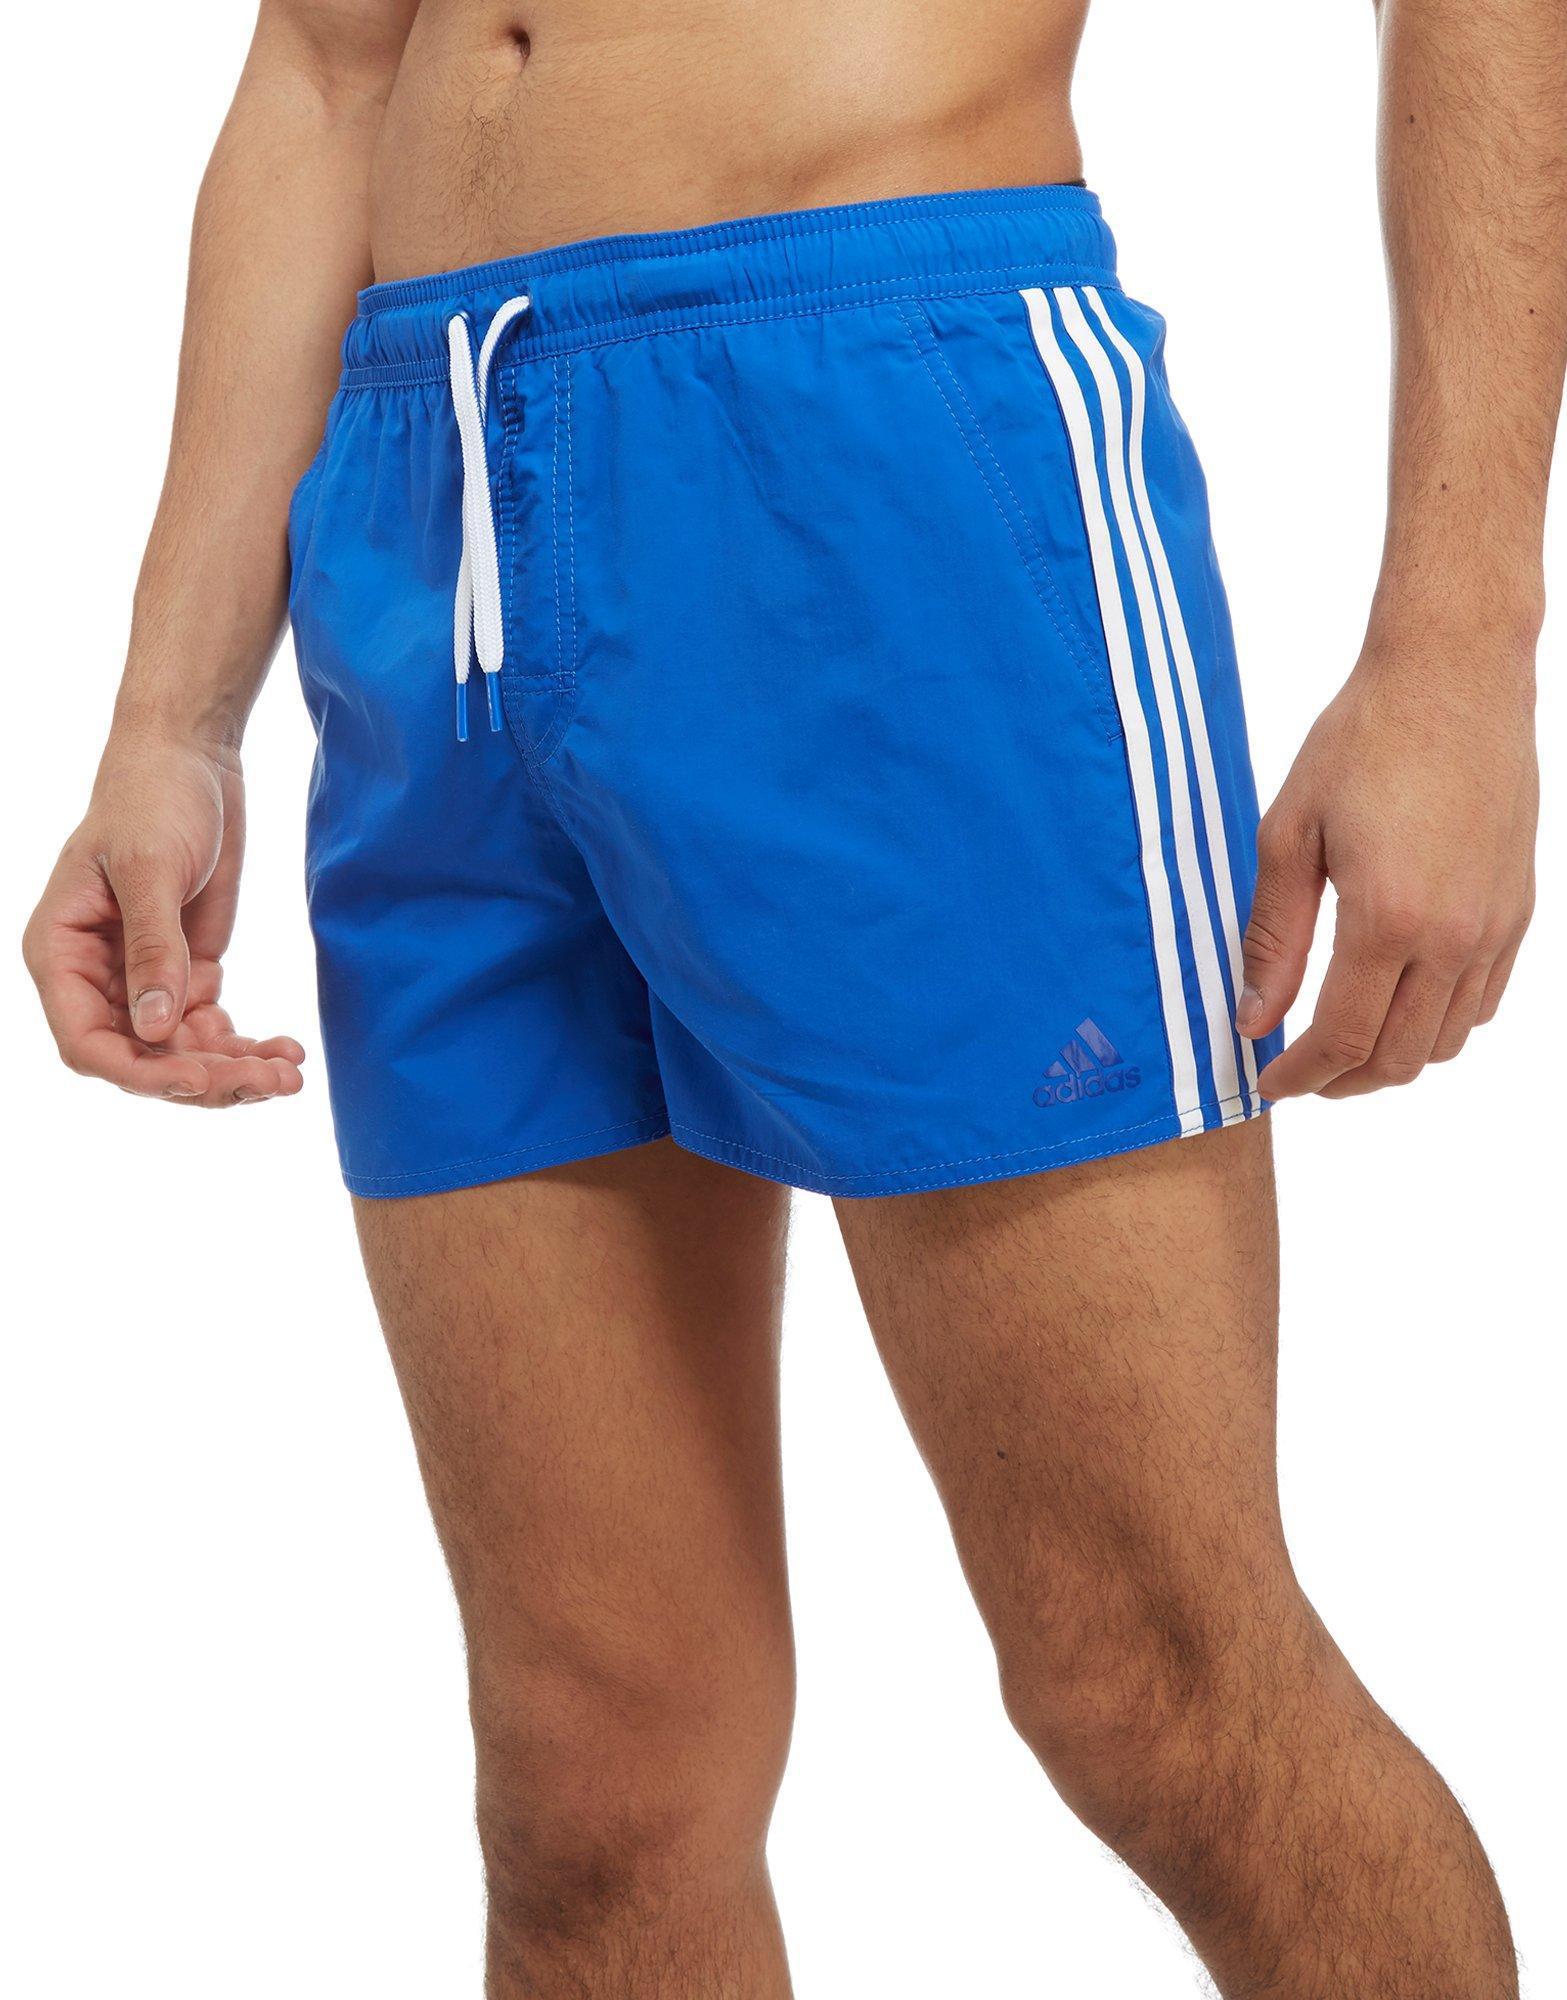 170e2a490dacd adidas 3-stripes Swim Shorts in Blue for Men - Lyst